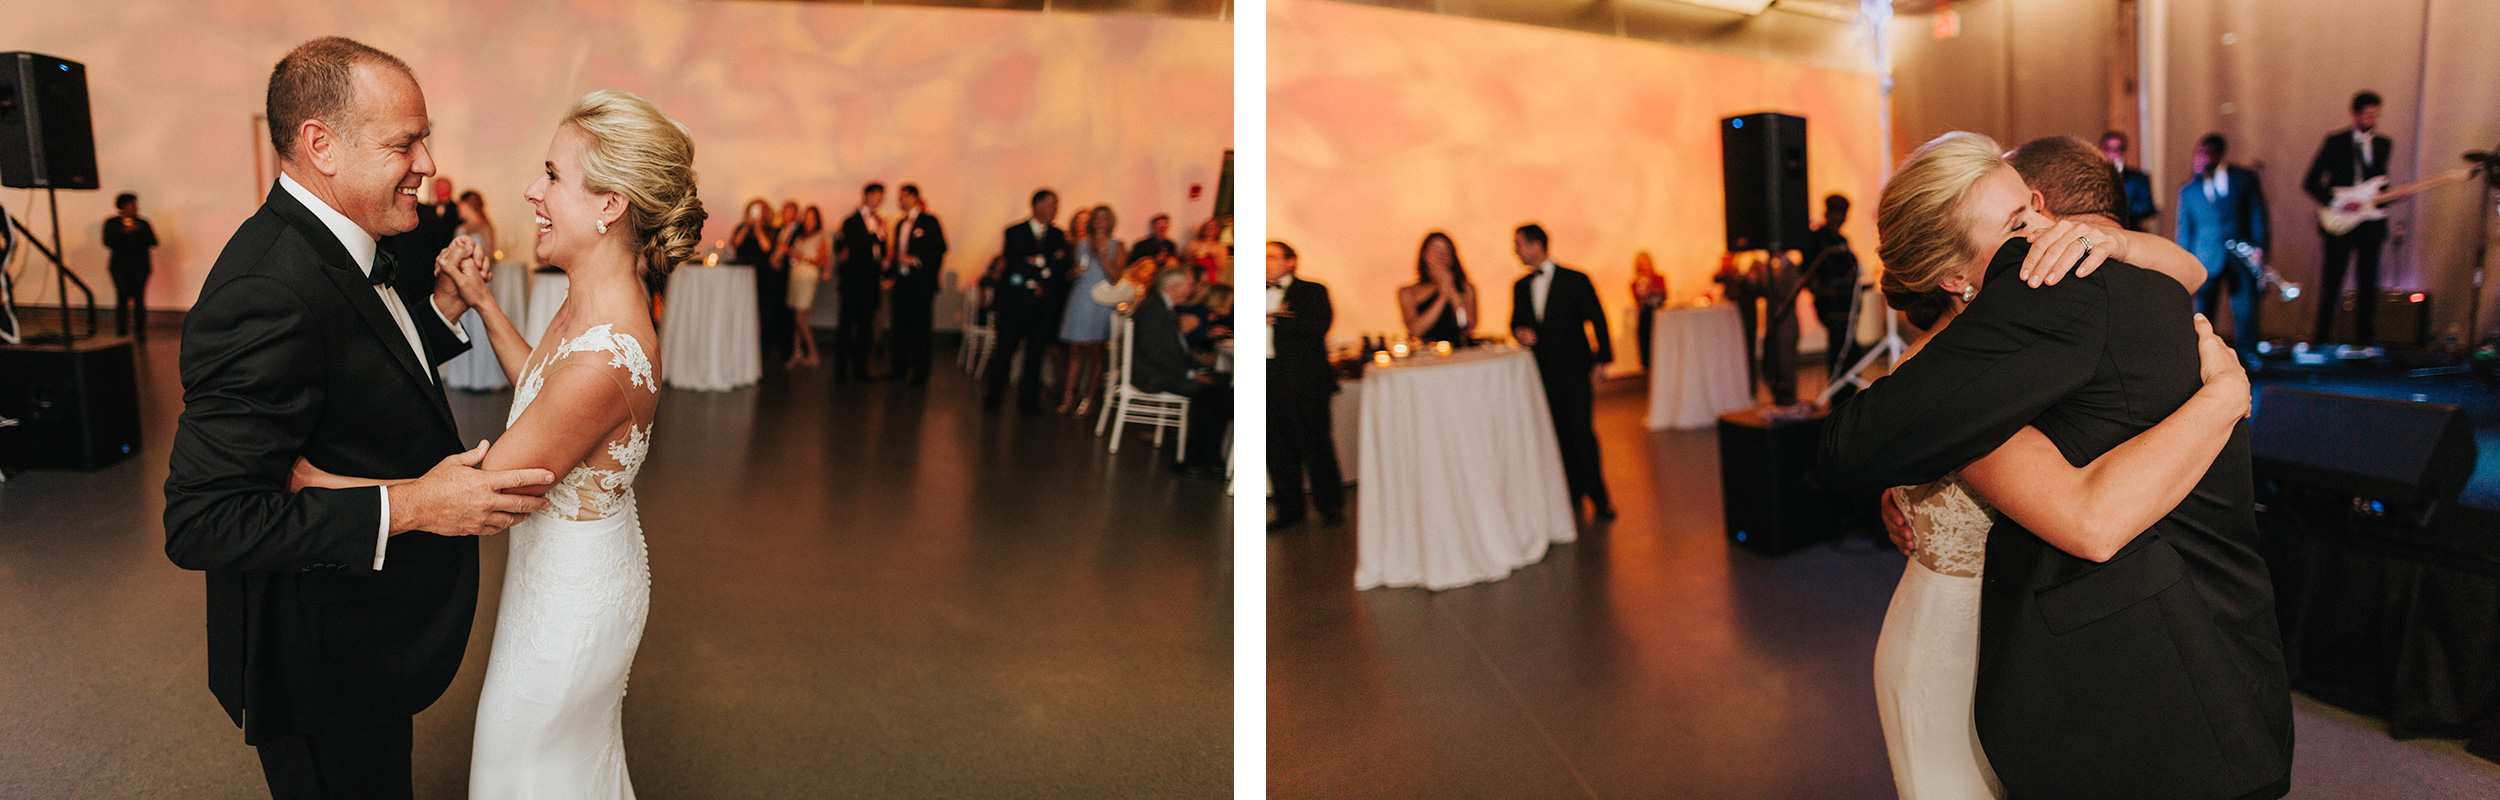 speed-art-museum-wedding-photographer-29.JPG